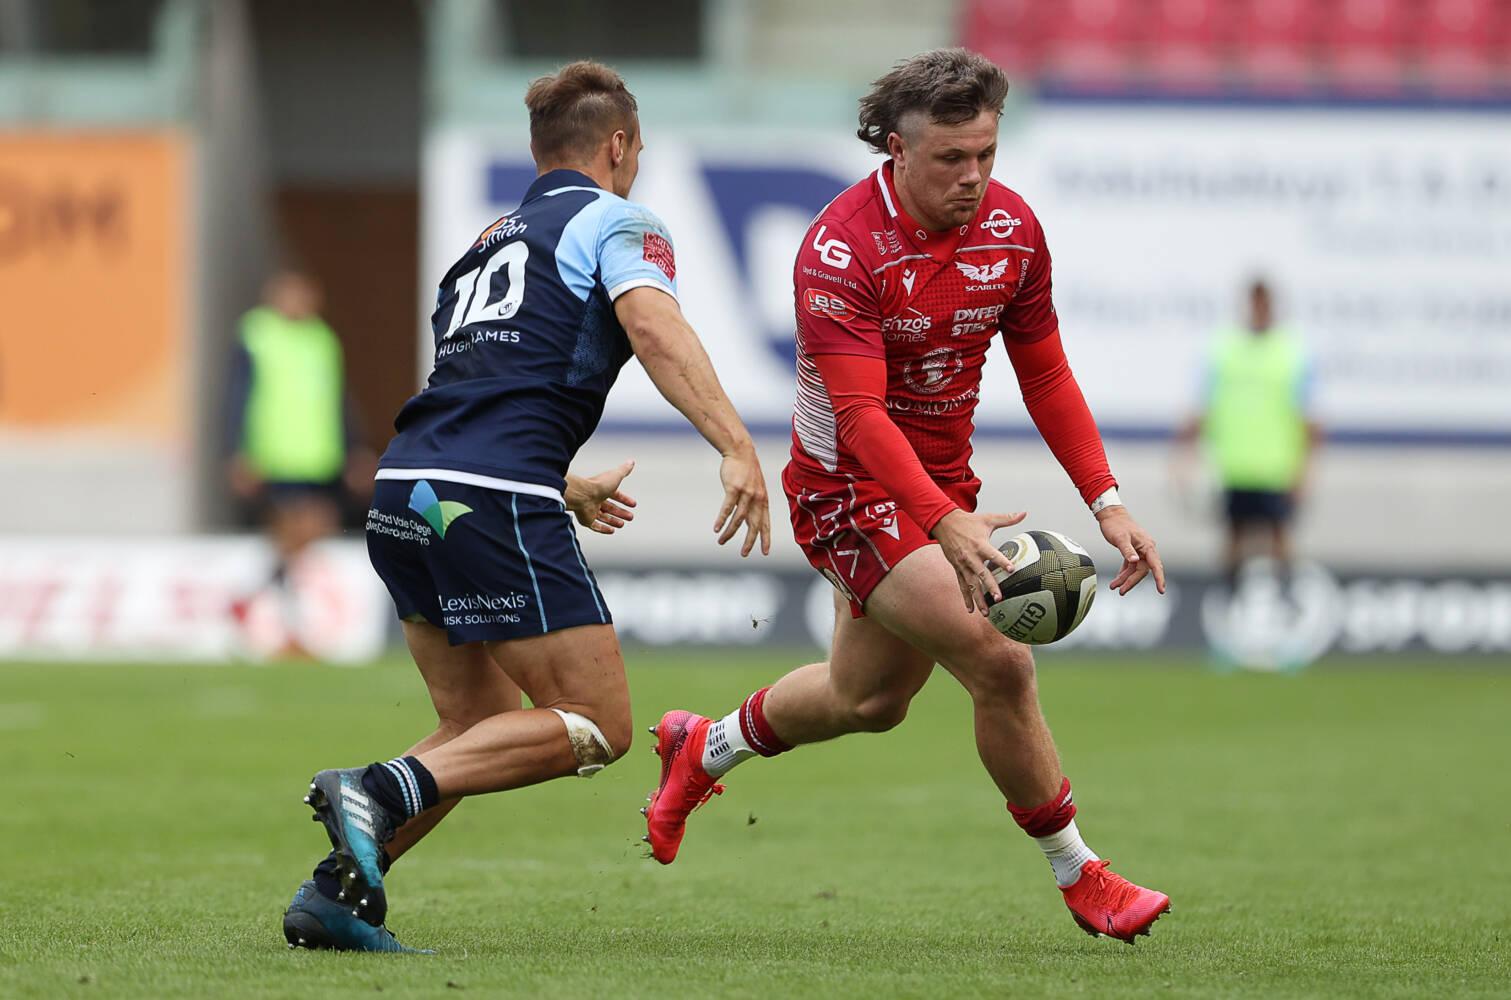 Evans talks fine form, mullets and Toulon